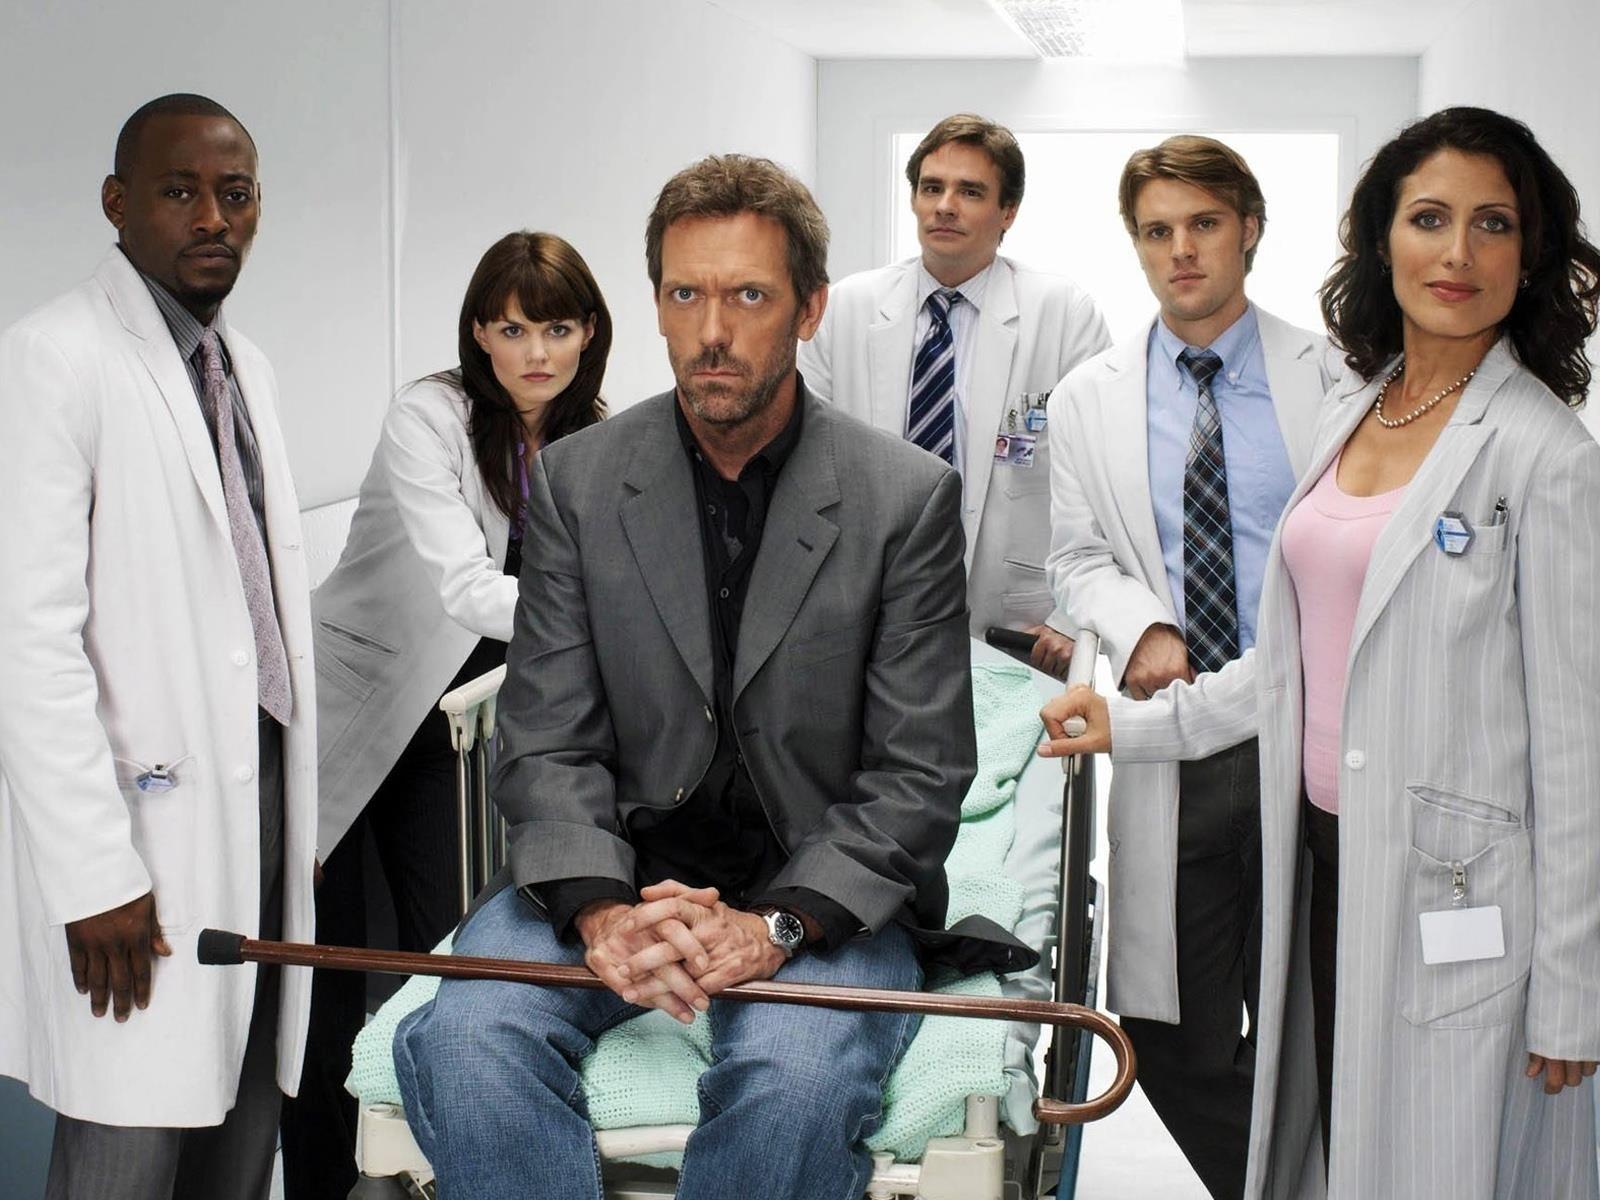 """House"" TV show Gregory house, House cast, Dr house"